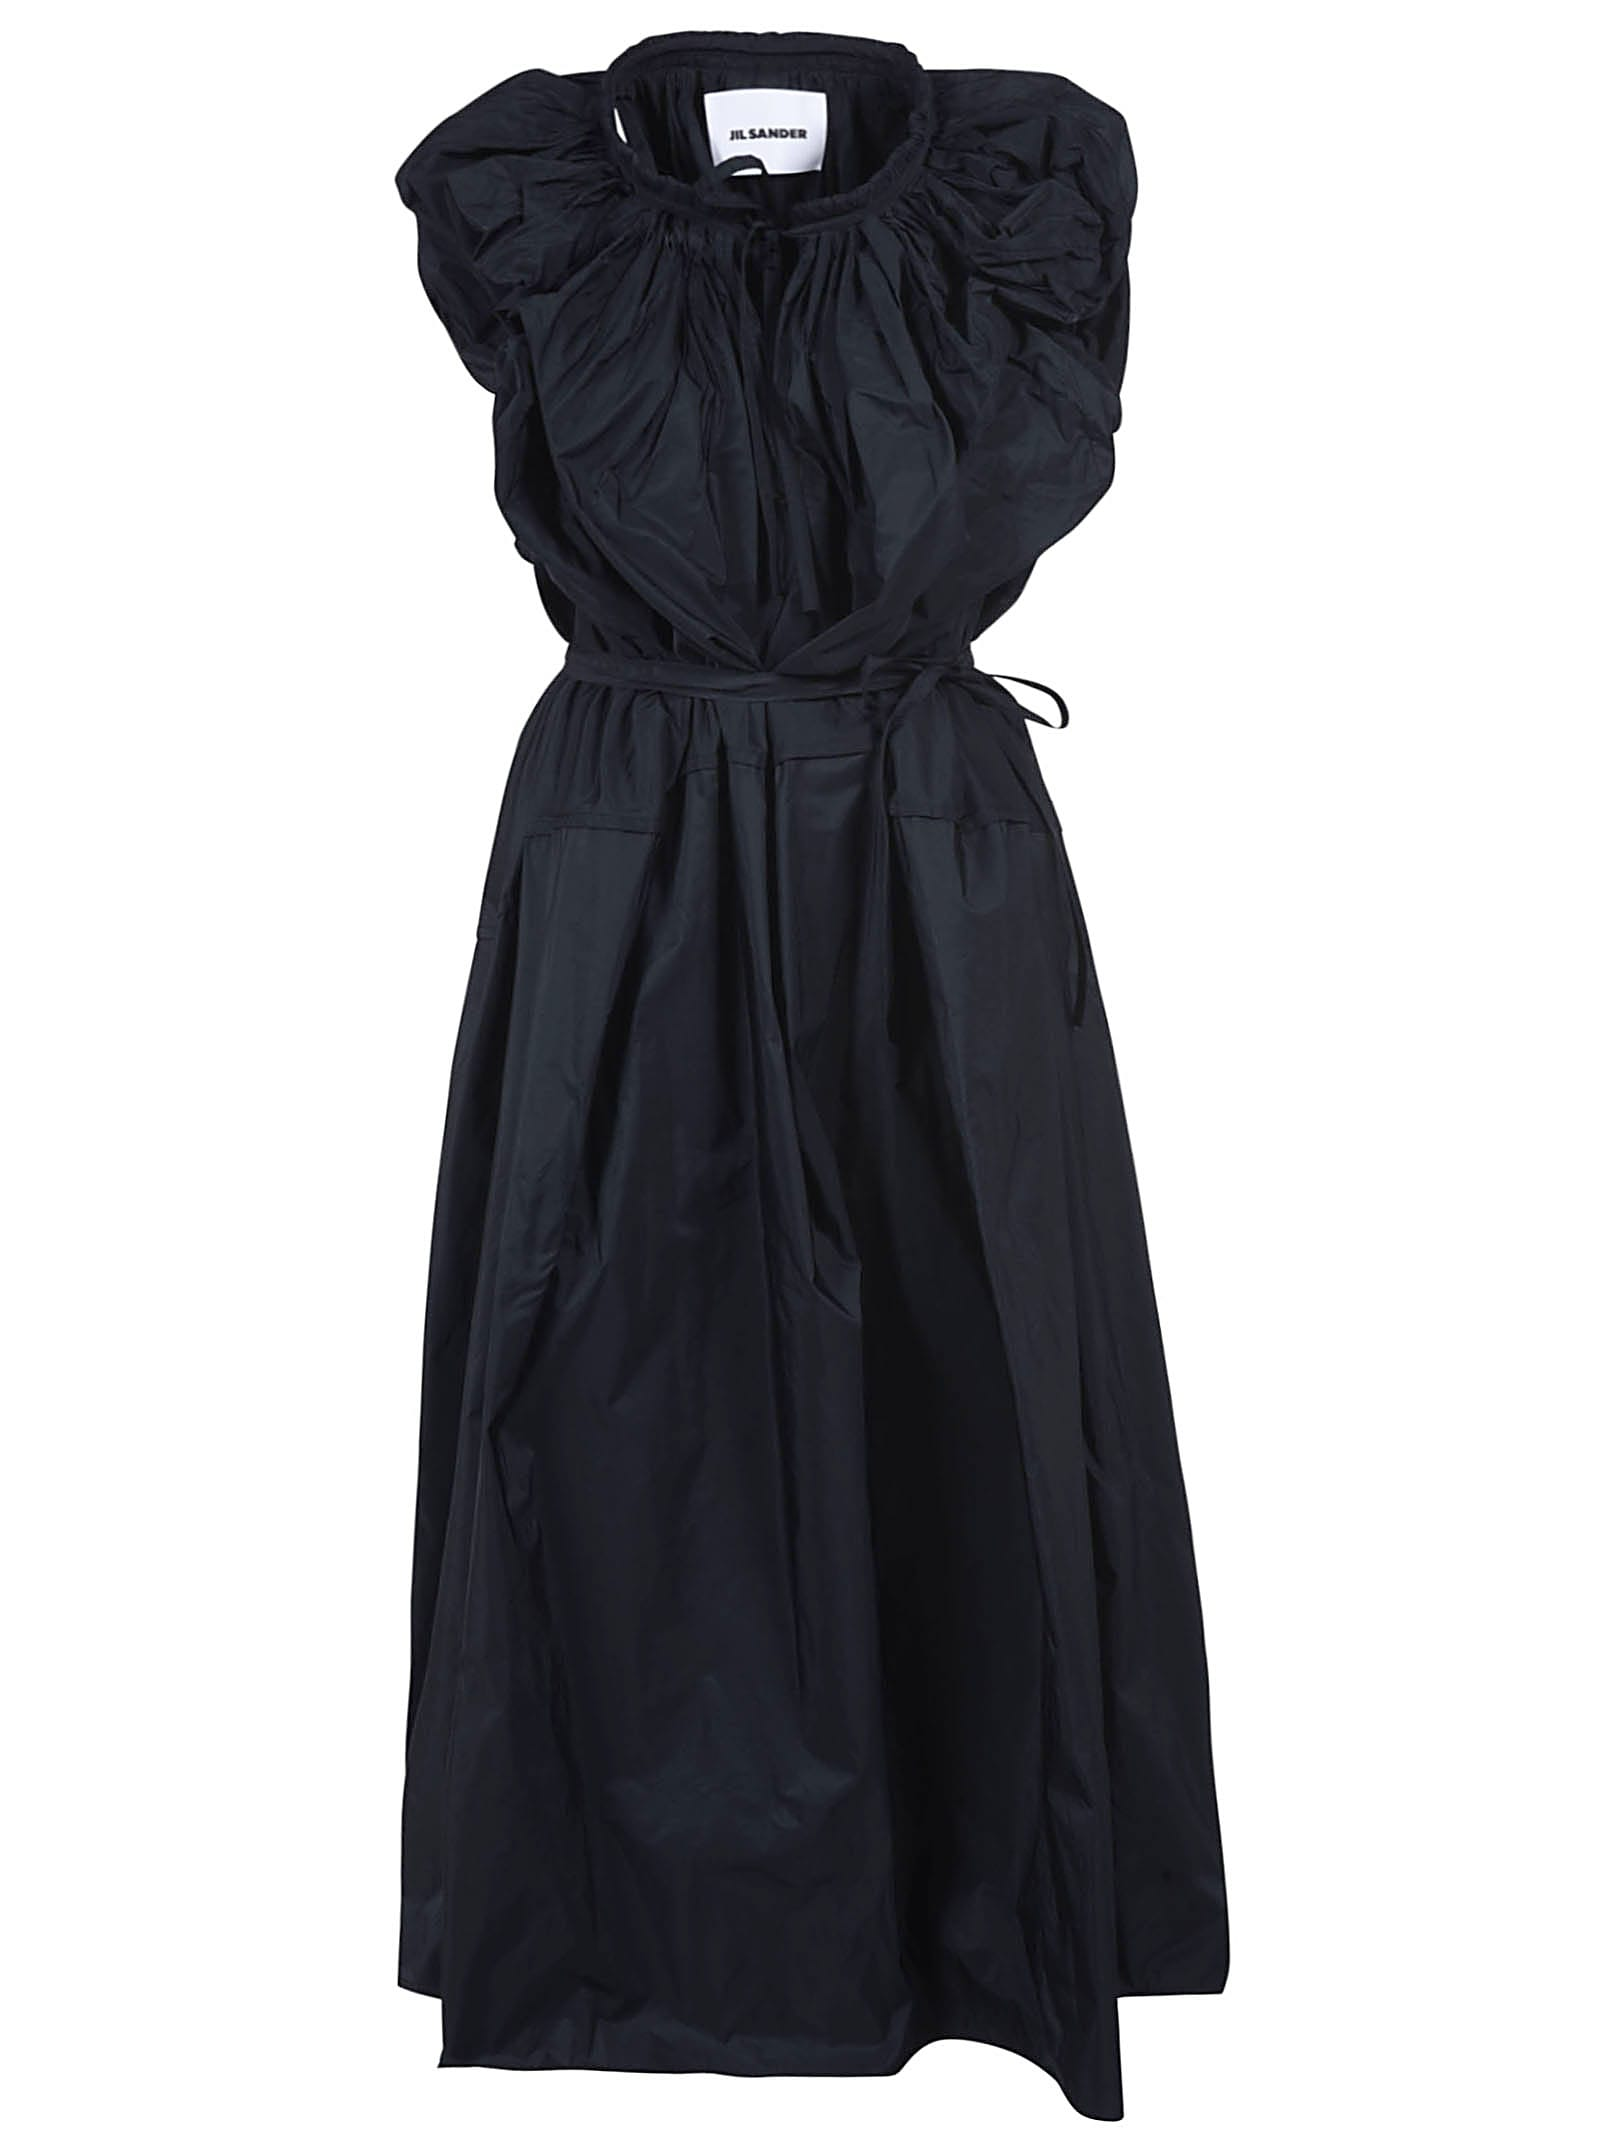 Buy Jil Sander Sleeveless Ruffled Dress online, shop Jil Sander with free shipping